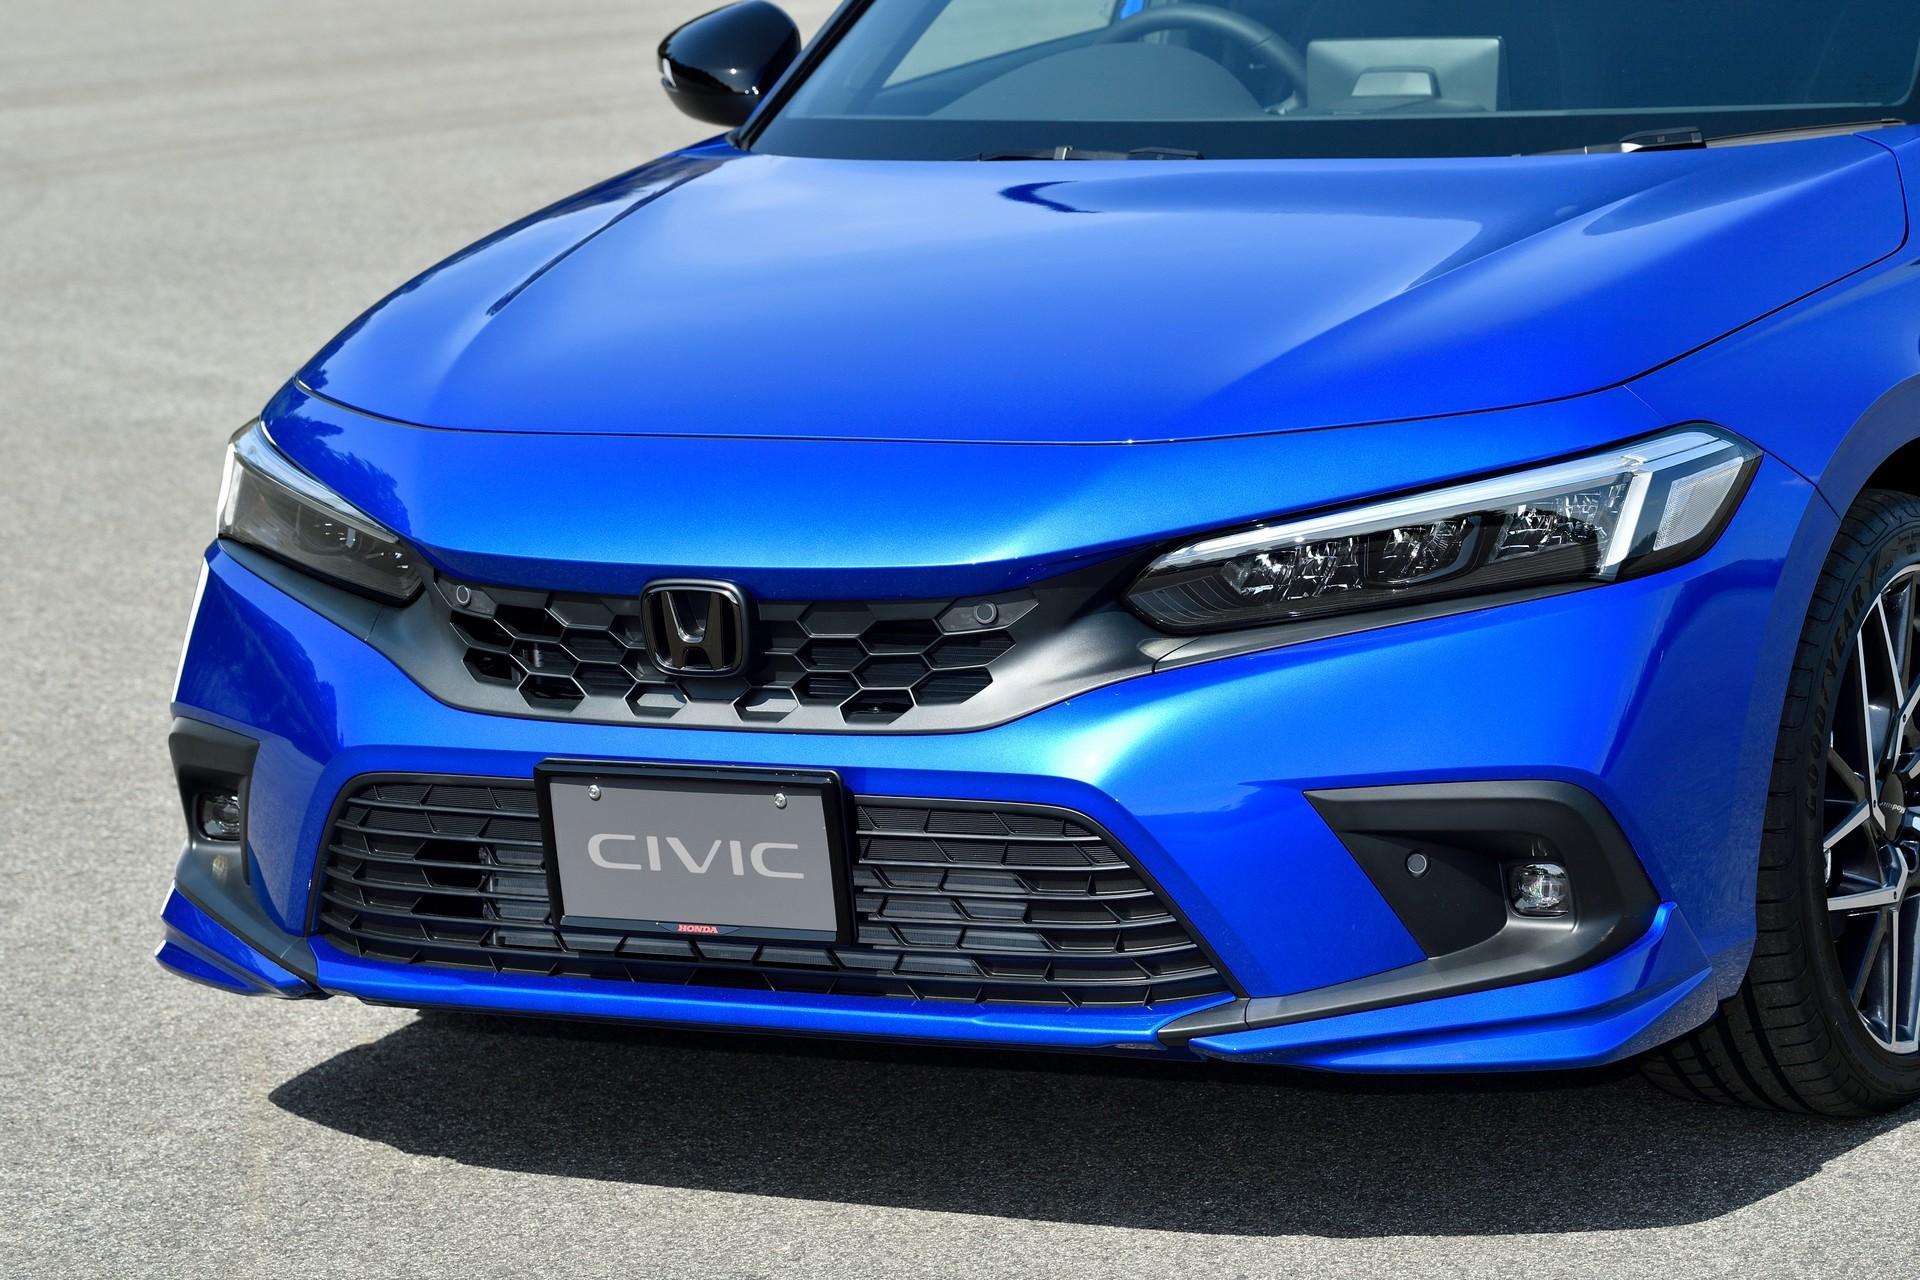 2022-Honda-Civic-Hatch-Accessories-12